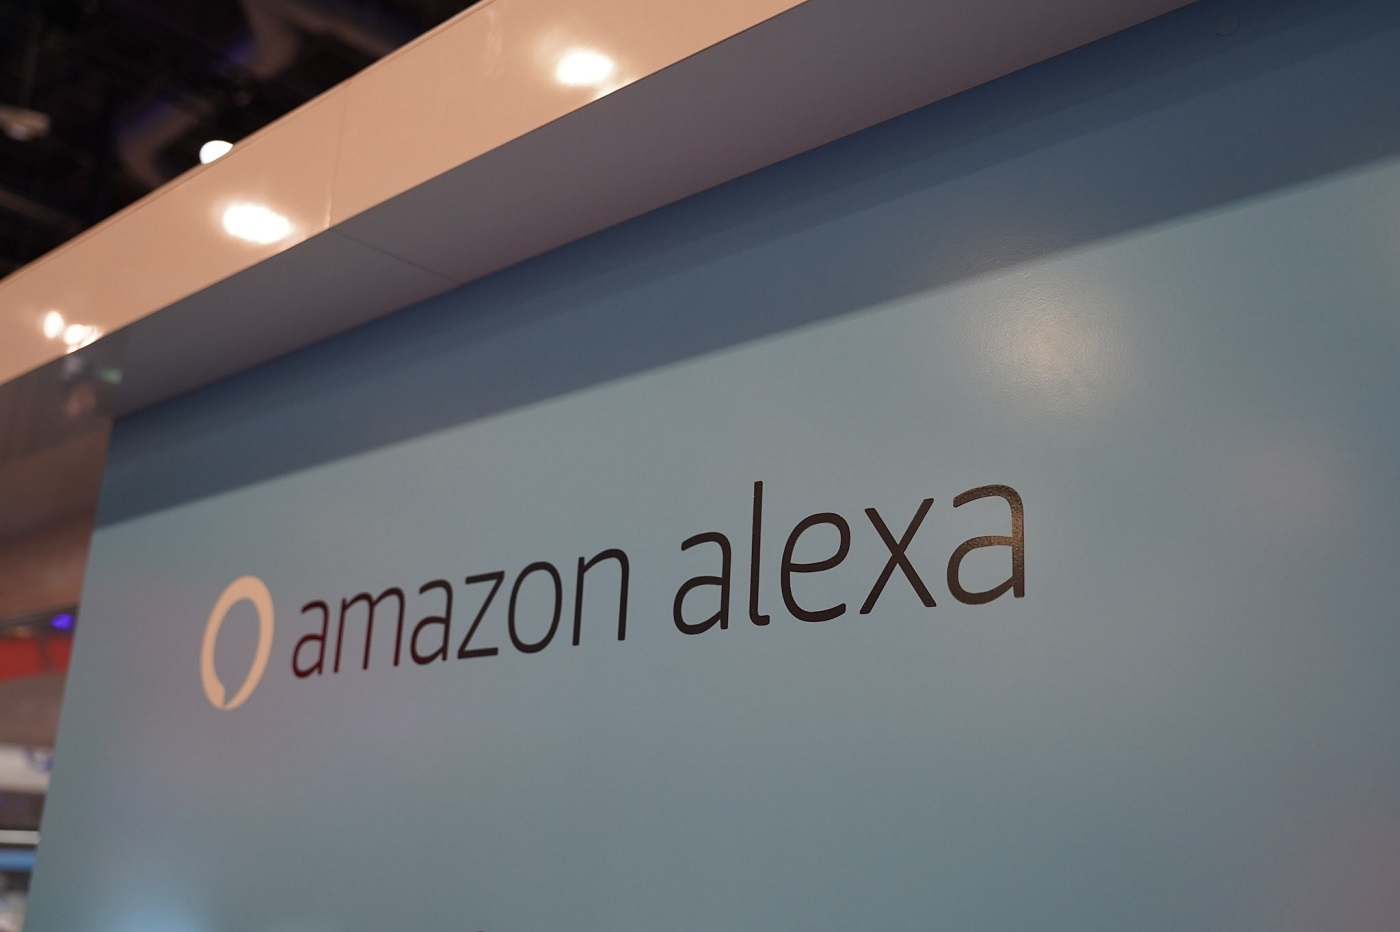 Le logo d'Amazon Alexa au CES 2020 de Las Vegas (Amazon Echo)